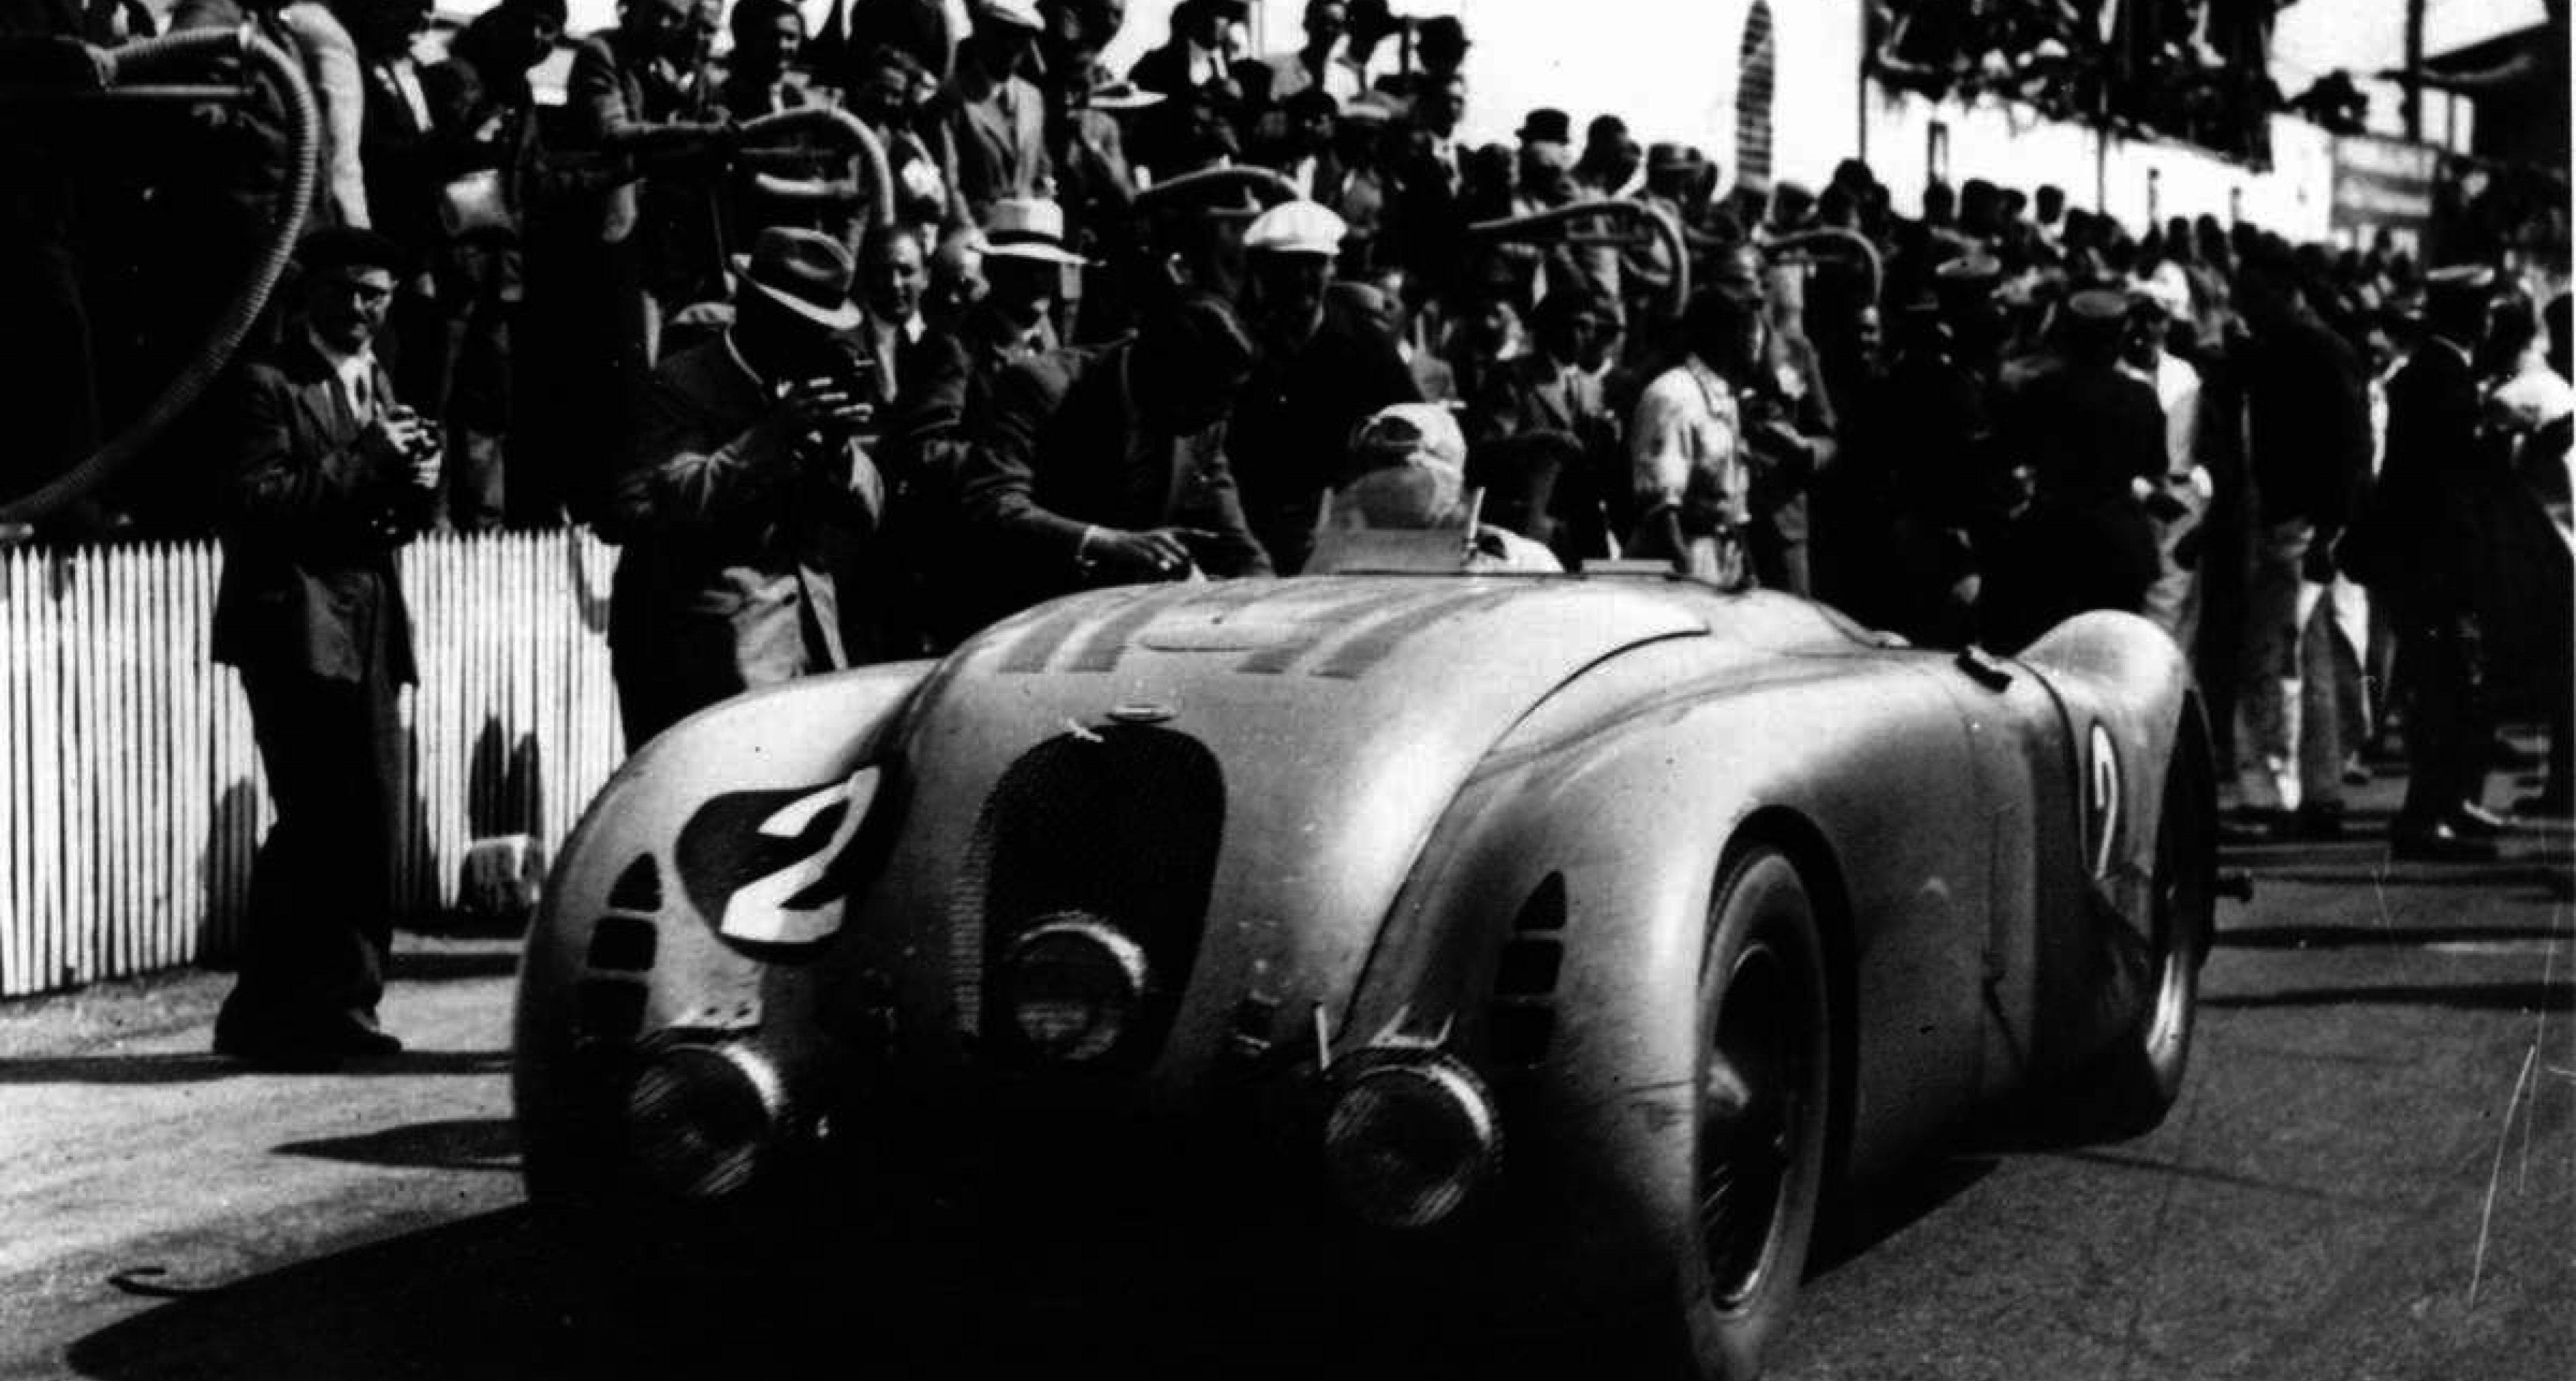 The winner of Le Mans 1937: Jean-Pierre Wimille in the Typ 57G Tank.